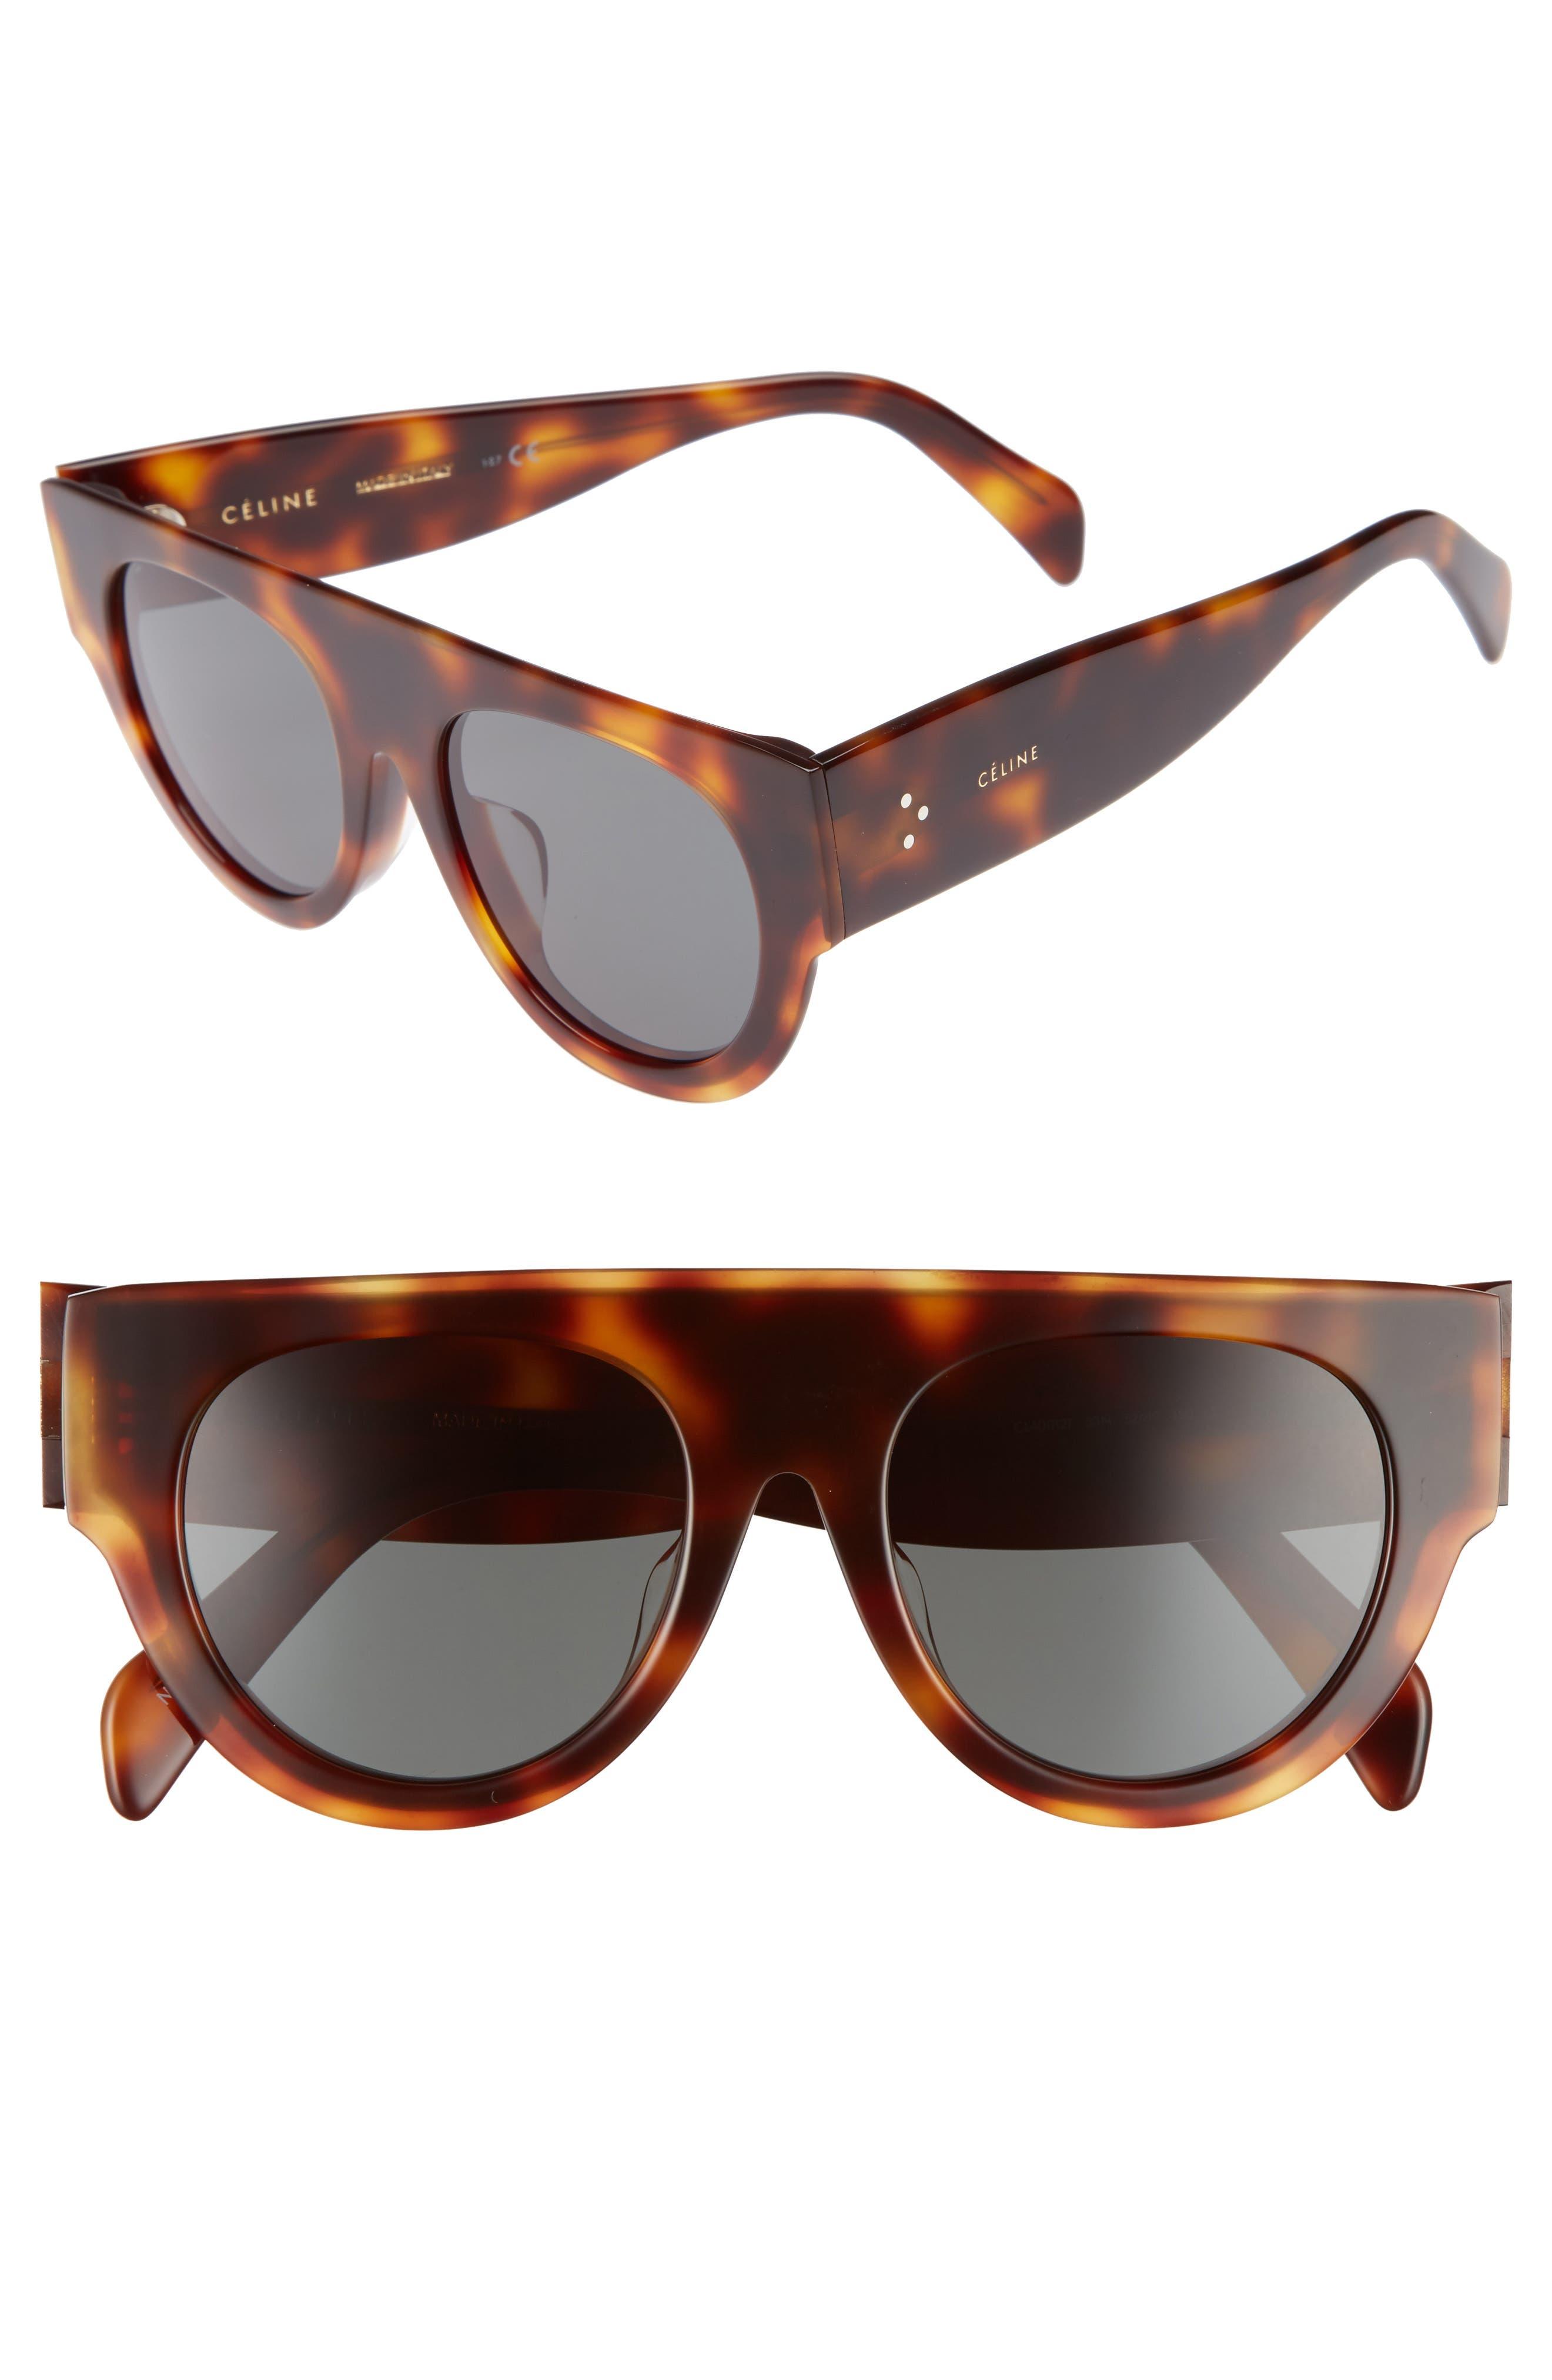 52mm Pilot Sunglasses,                         Main,                         color, Blonde Havana/ Green